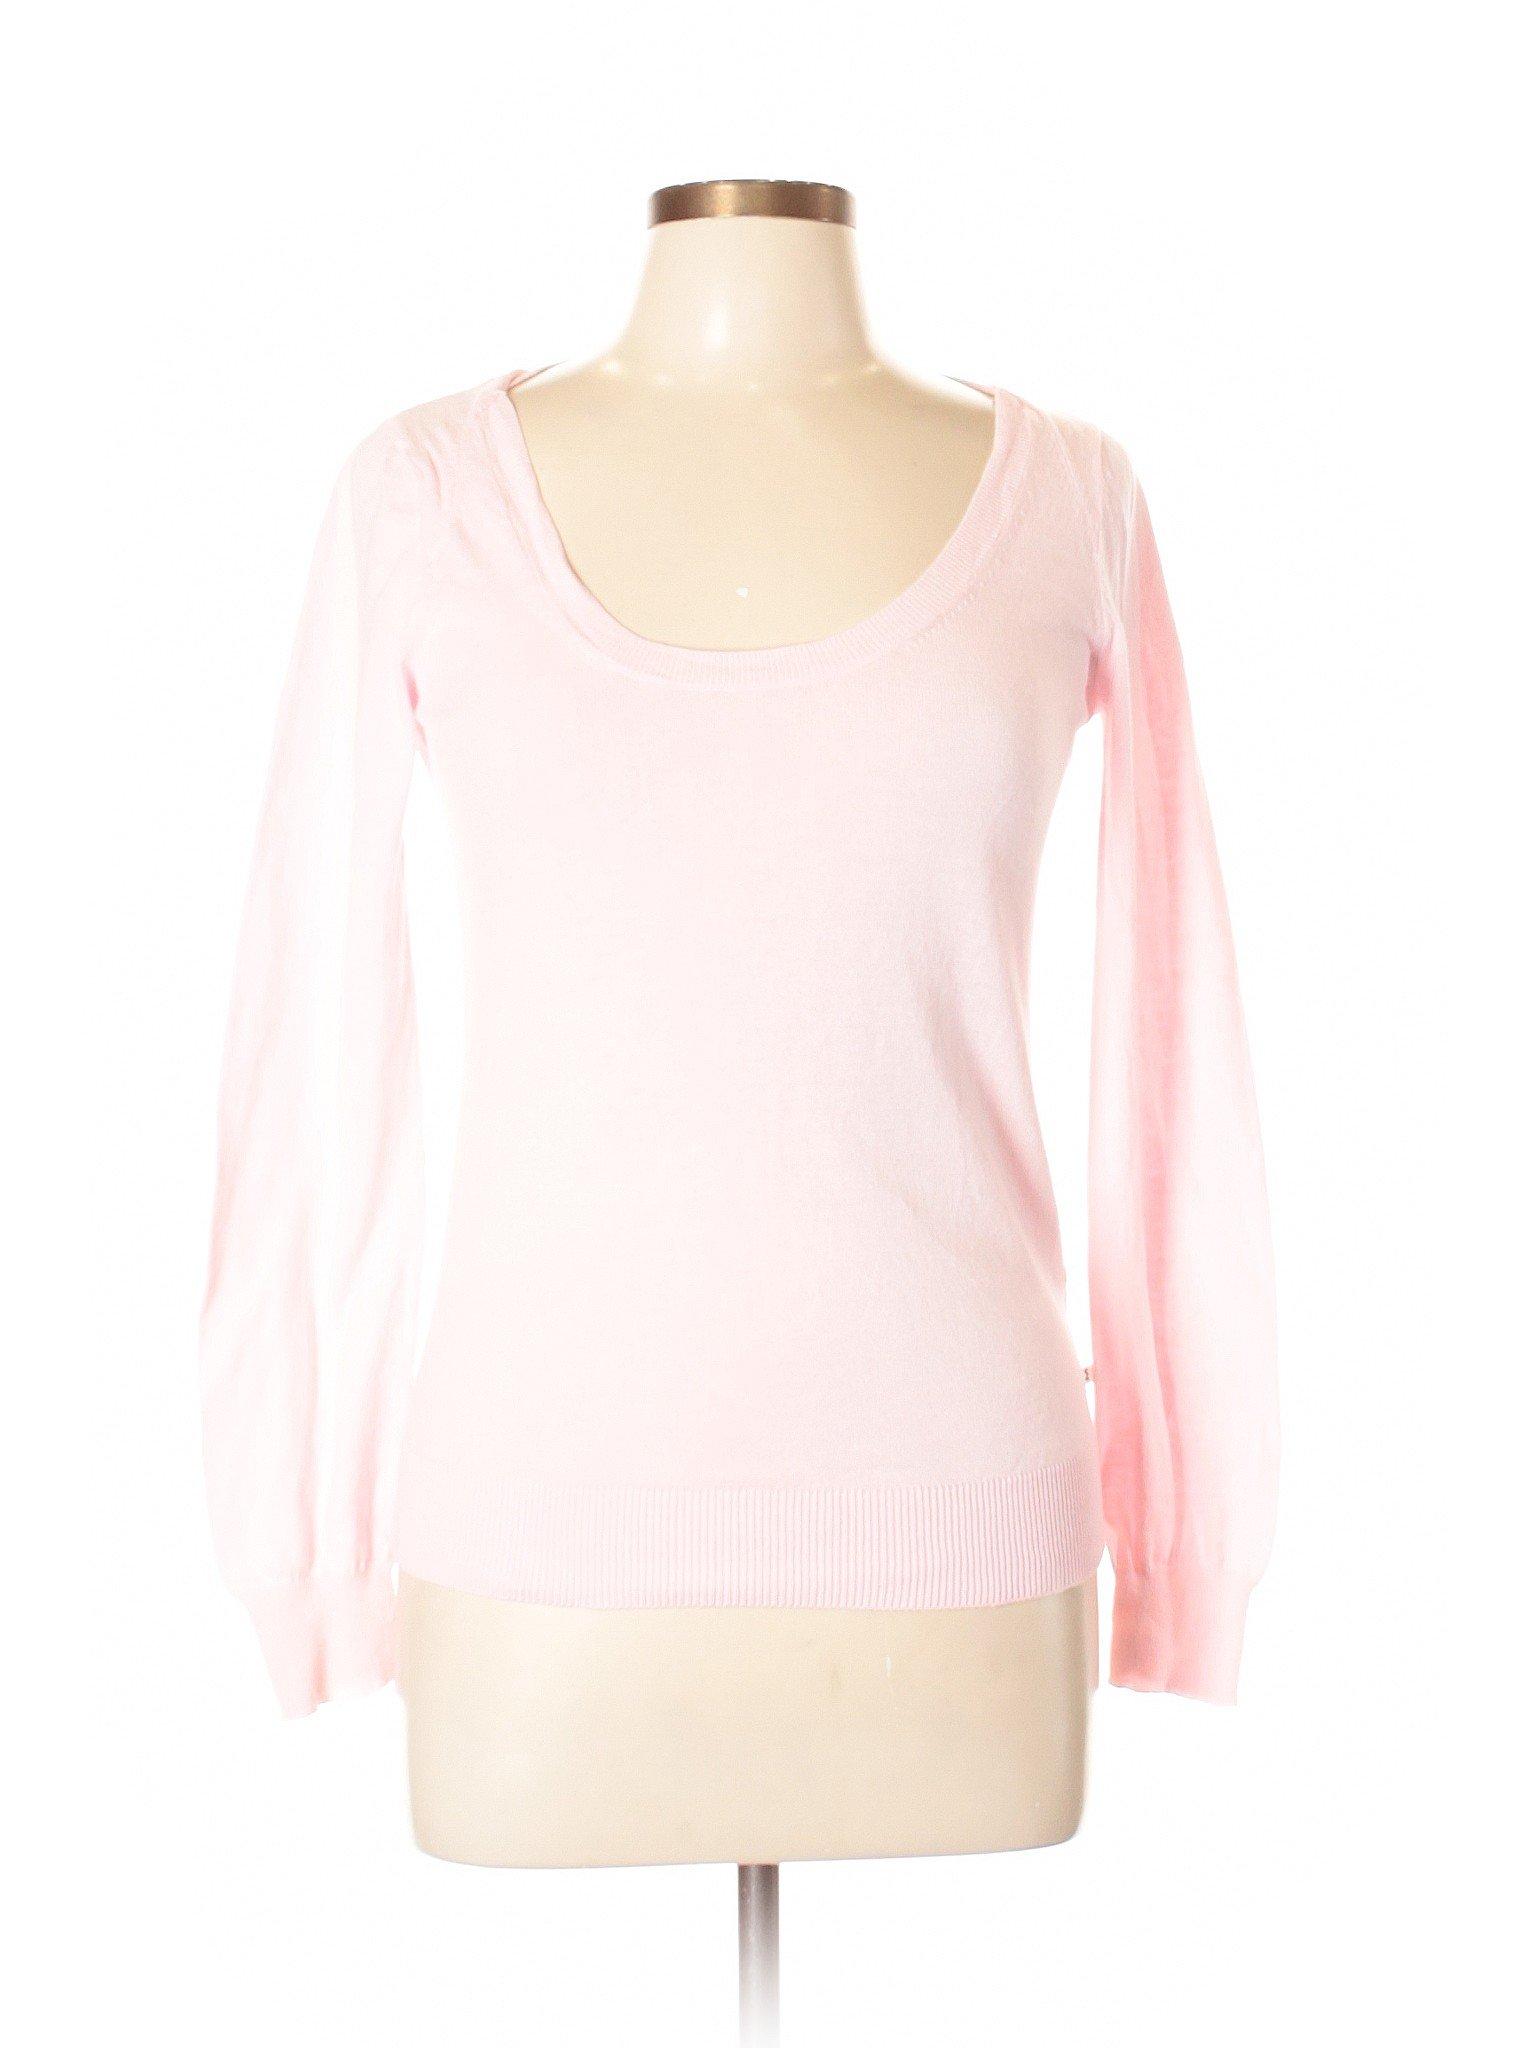 Pullover Gap Pullover Sweater Boutique Boutique Gap zSPBIqxU